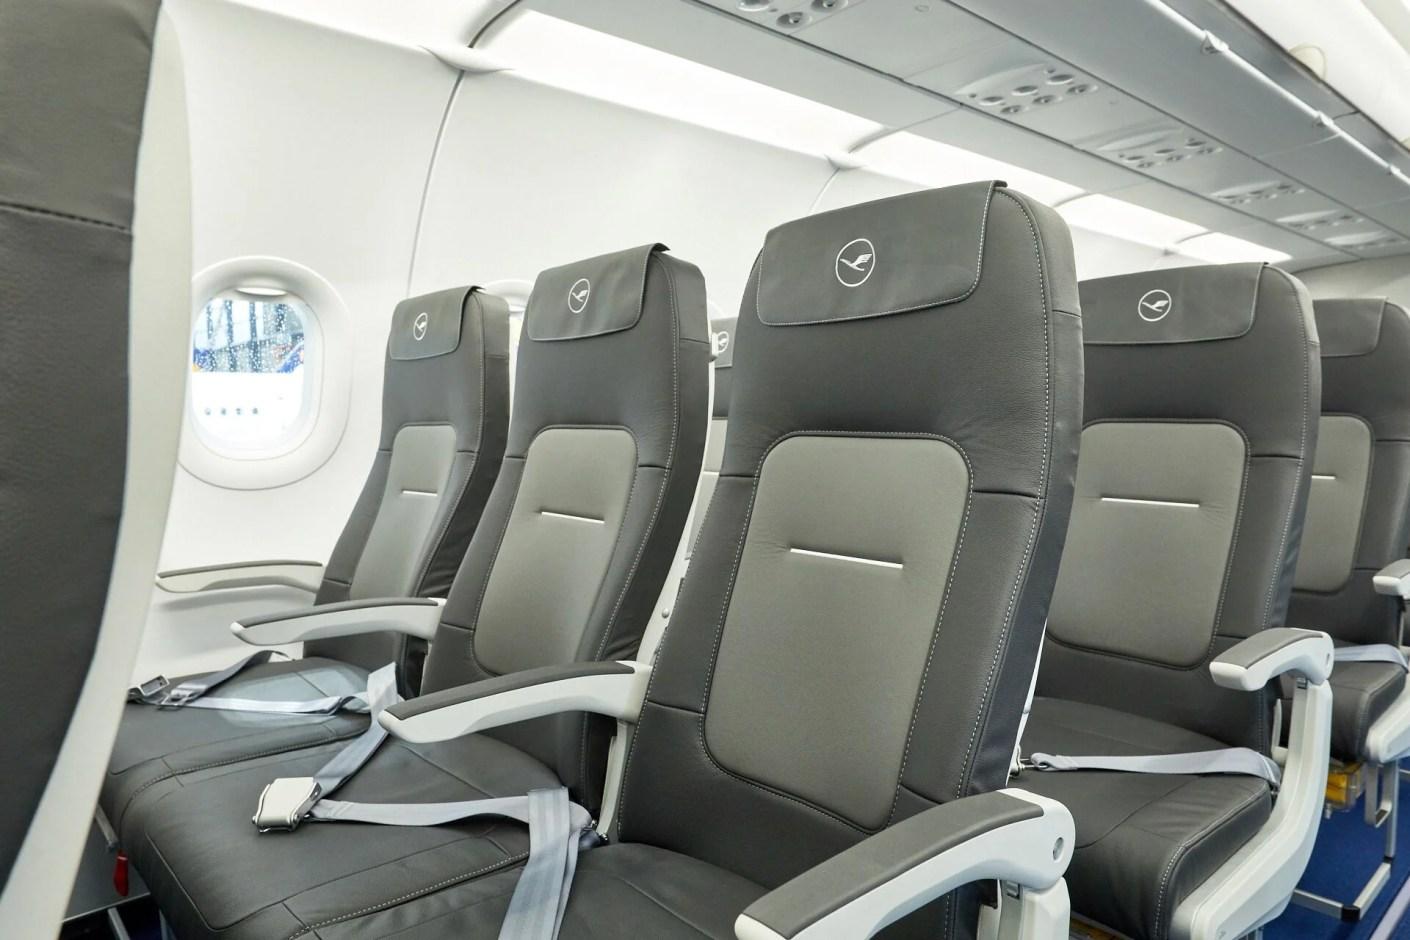 Lufthansa's new Airbus cabin (Image courtesy of Lufthansa)